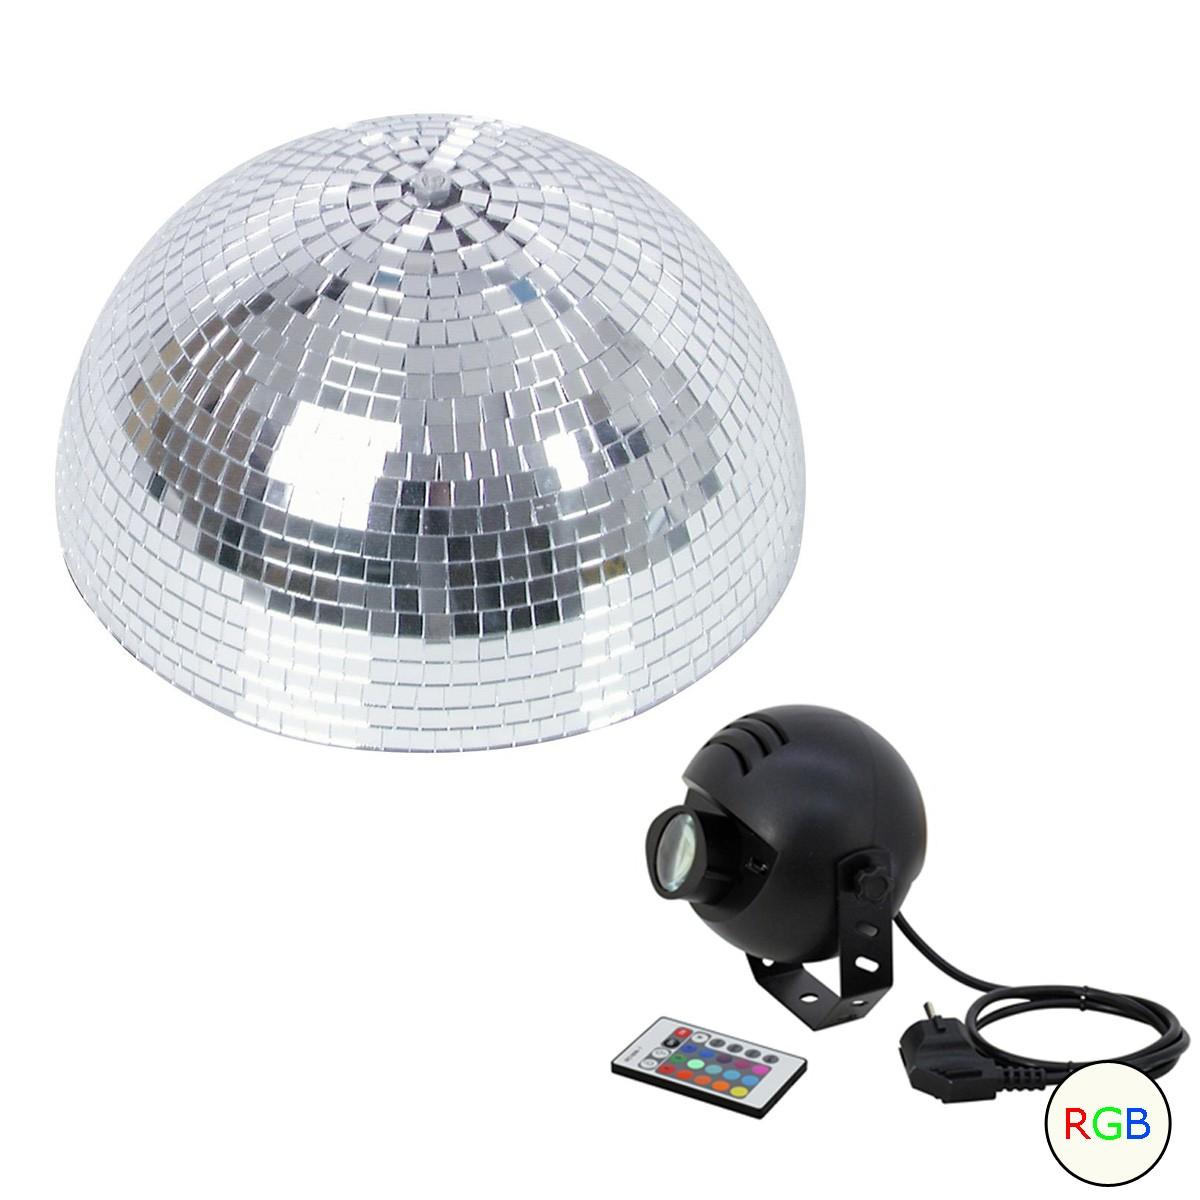 Set Halbspiegelkugel 30cm + 1 x LED Pinspot 9W Farbwechser RGB